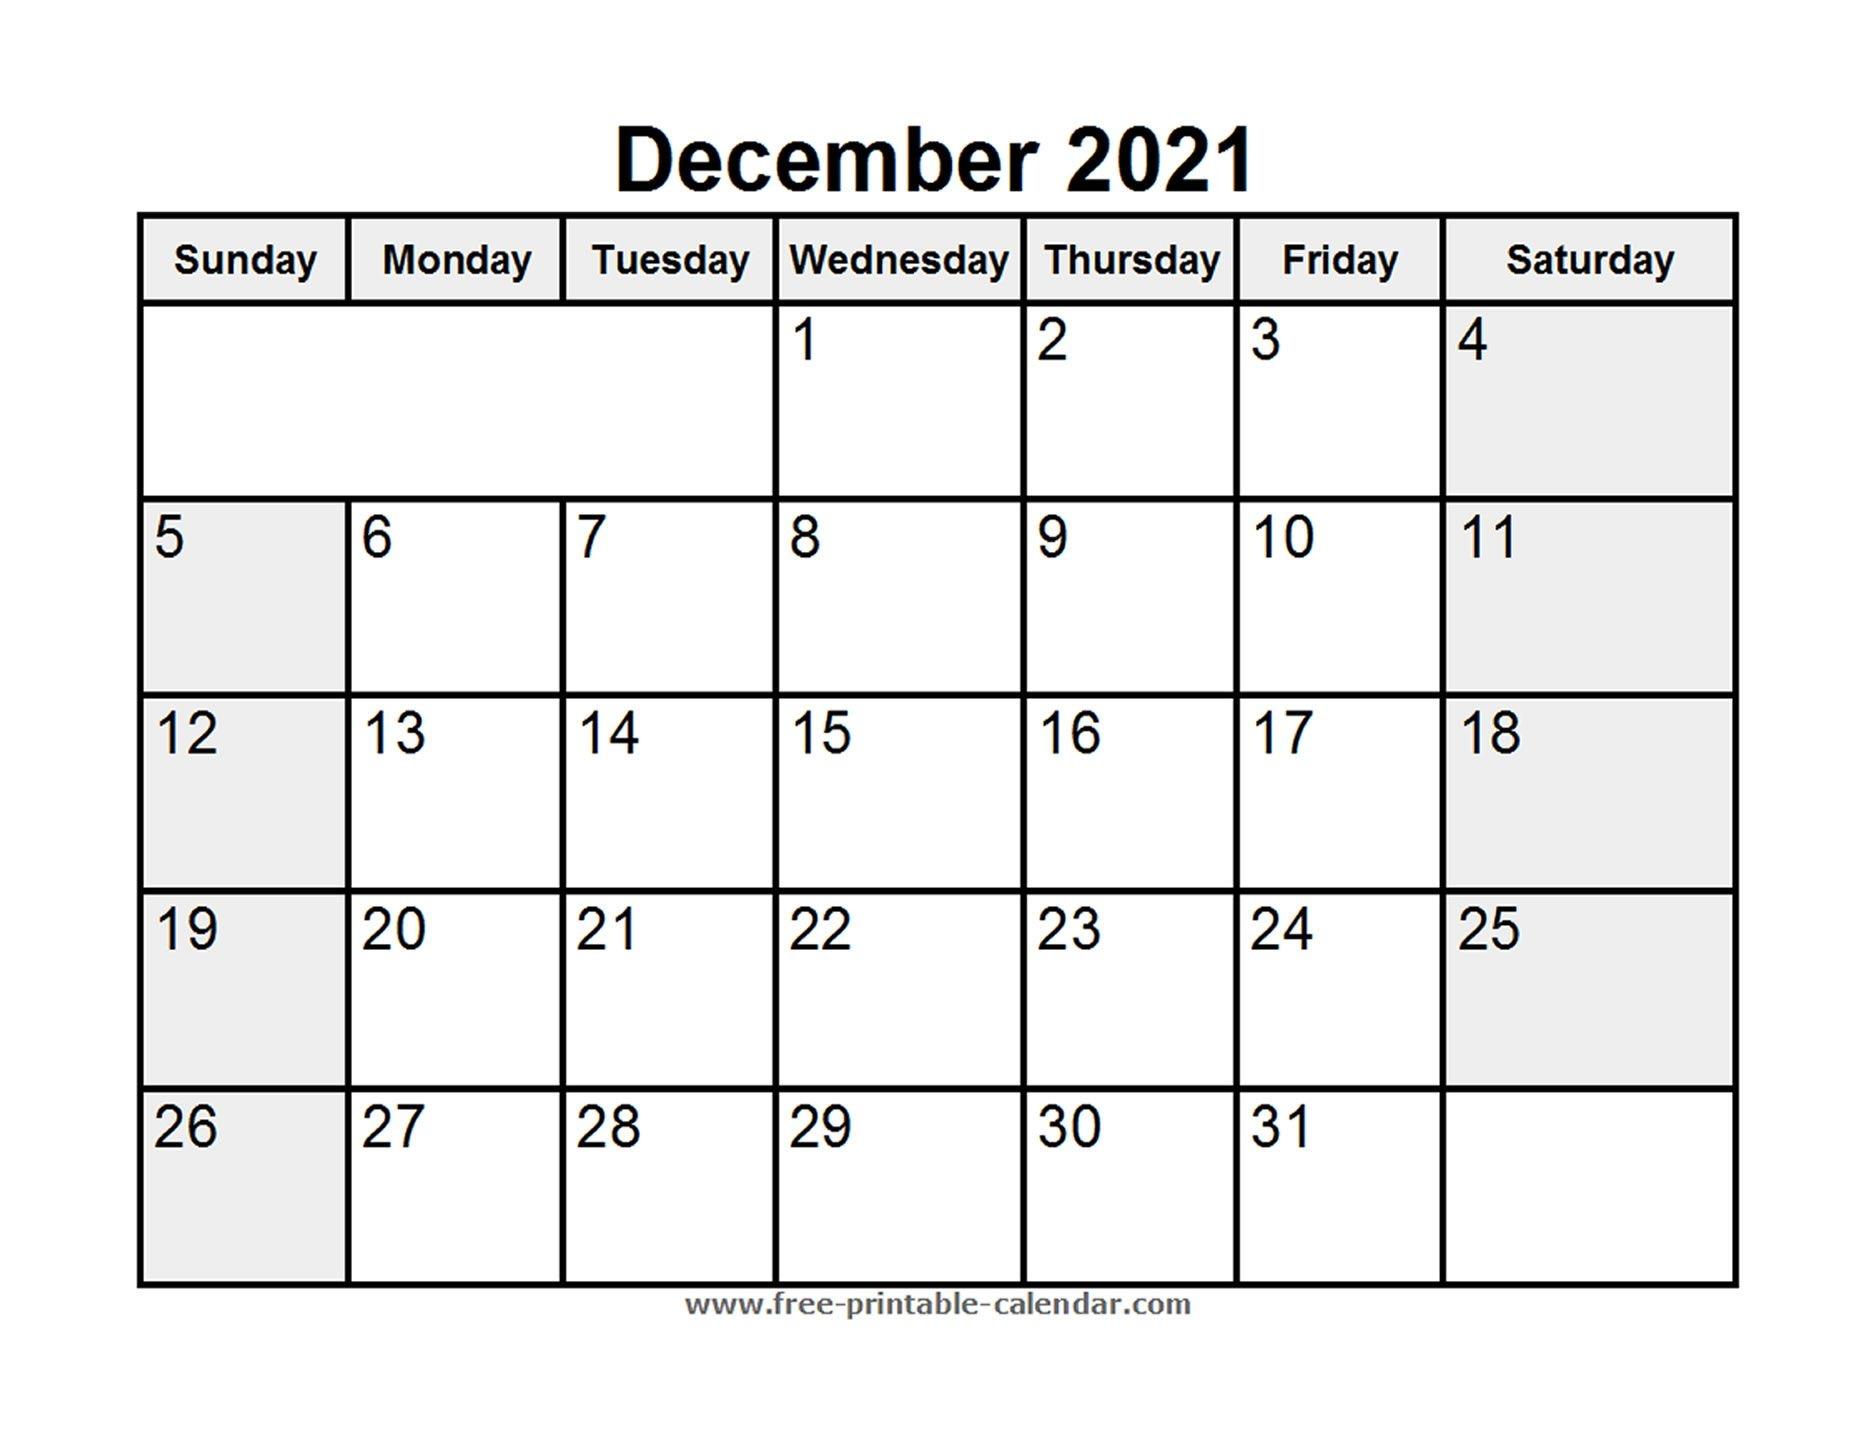 Printable December 2021 Calendar - Free-Printable-Calendar